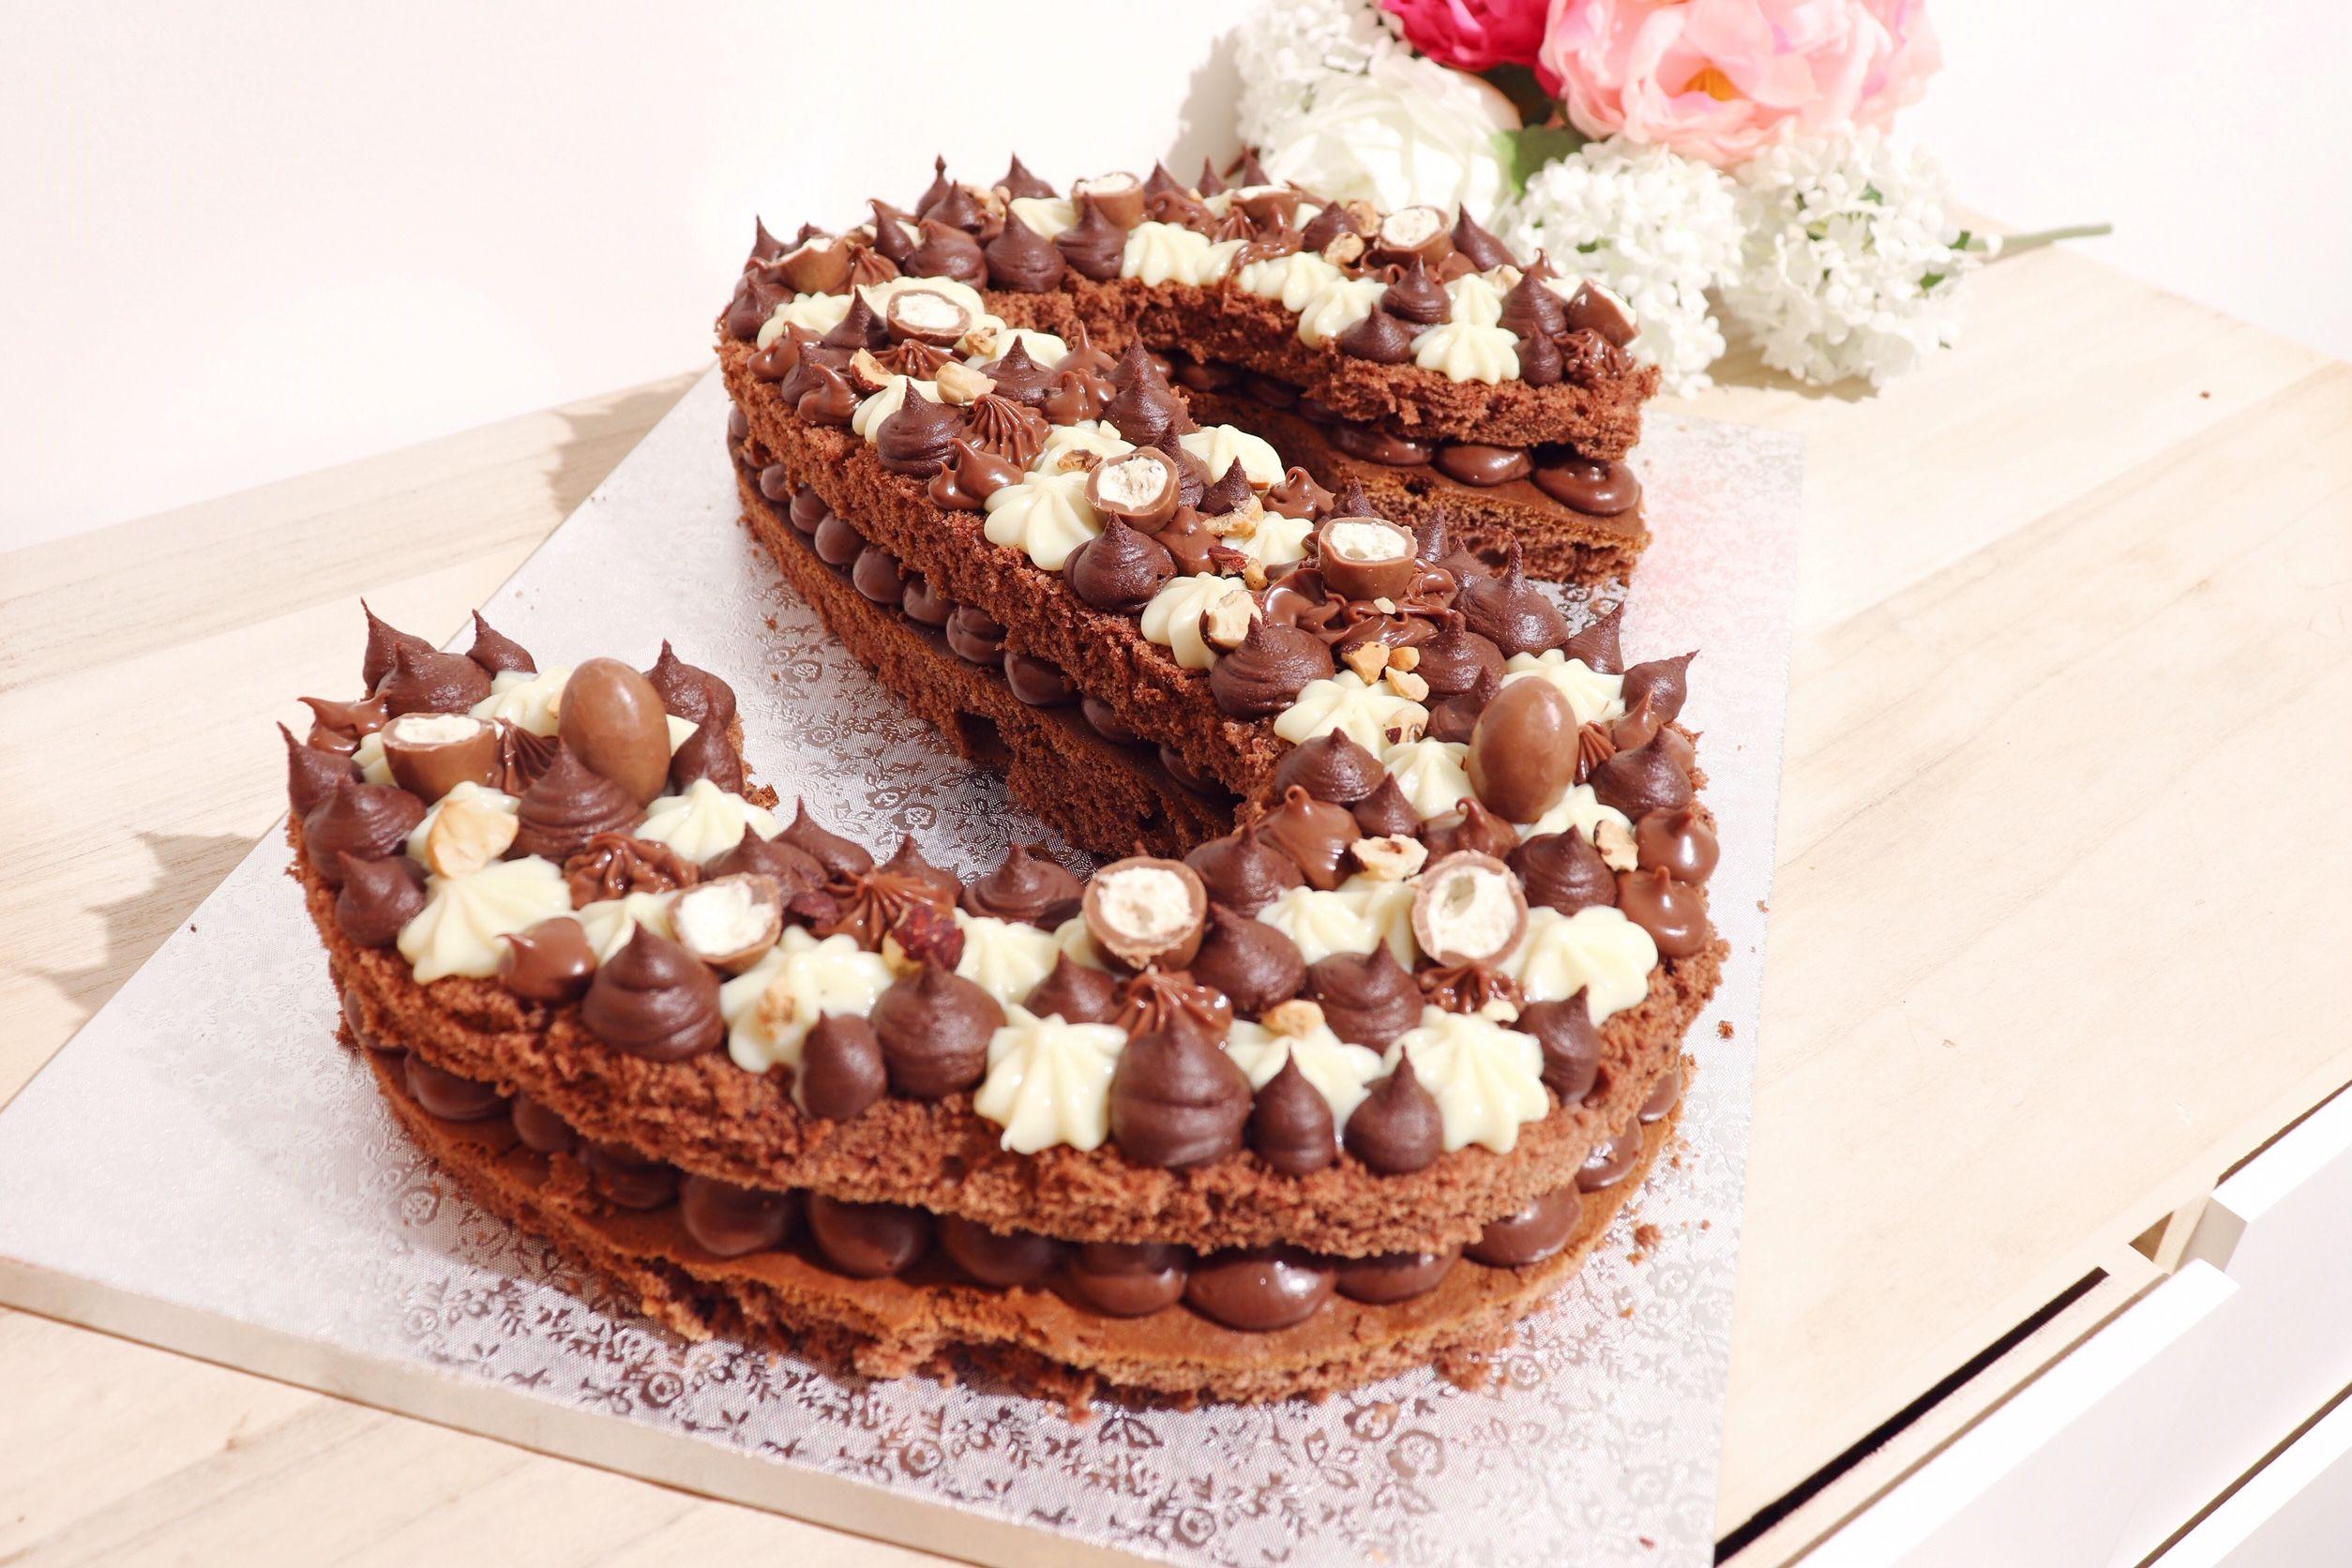 number cake 3 chocolats recette patisserie léa patisseries inspirées